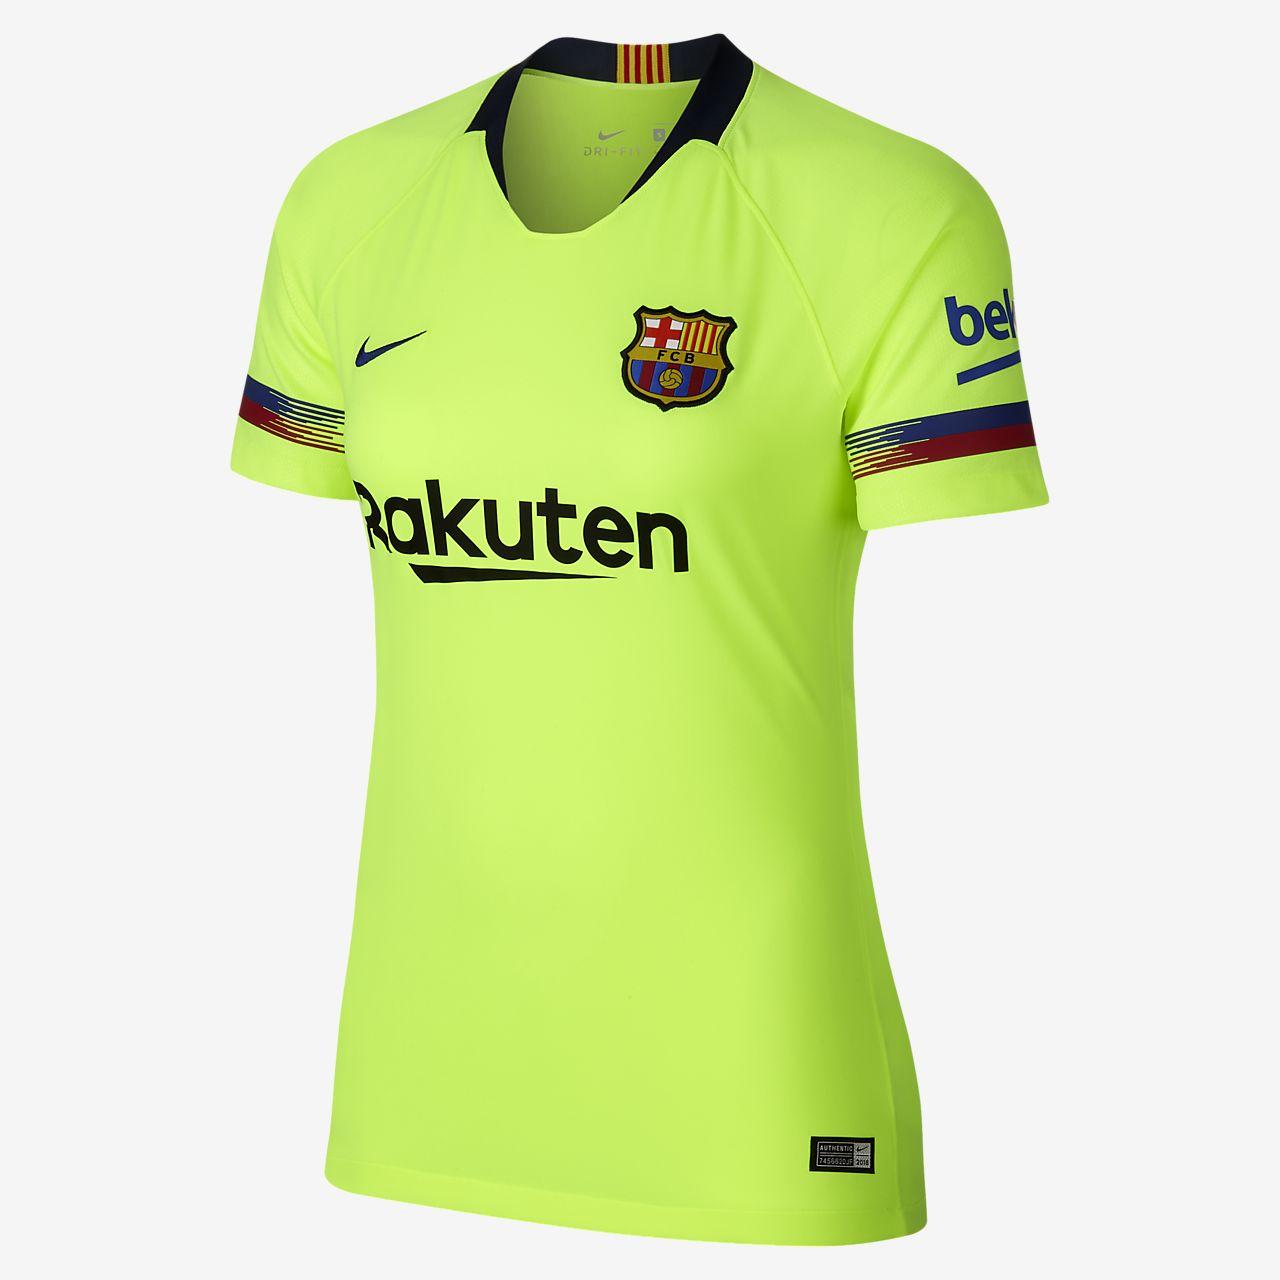 62e3554cf92fc Camiseta de fútbol para mujer 2018 19 FC Barcelona Stadium Away ...